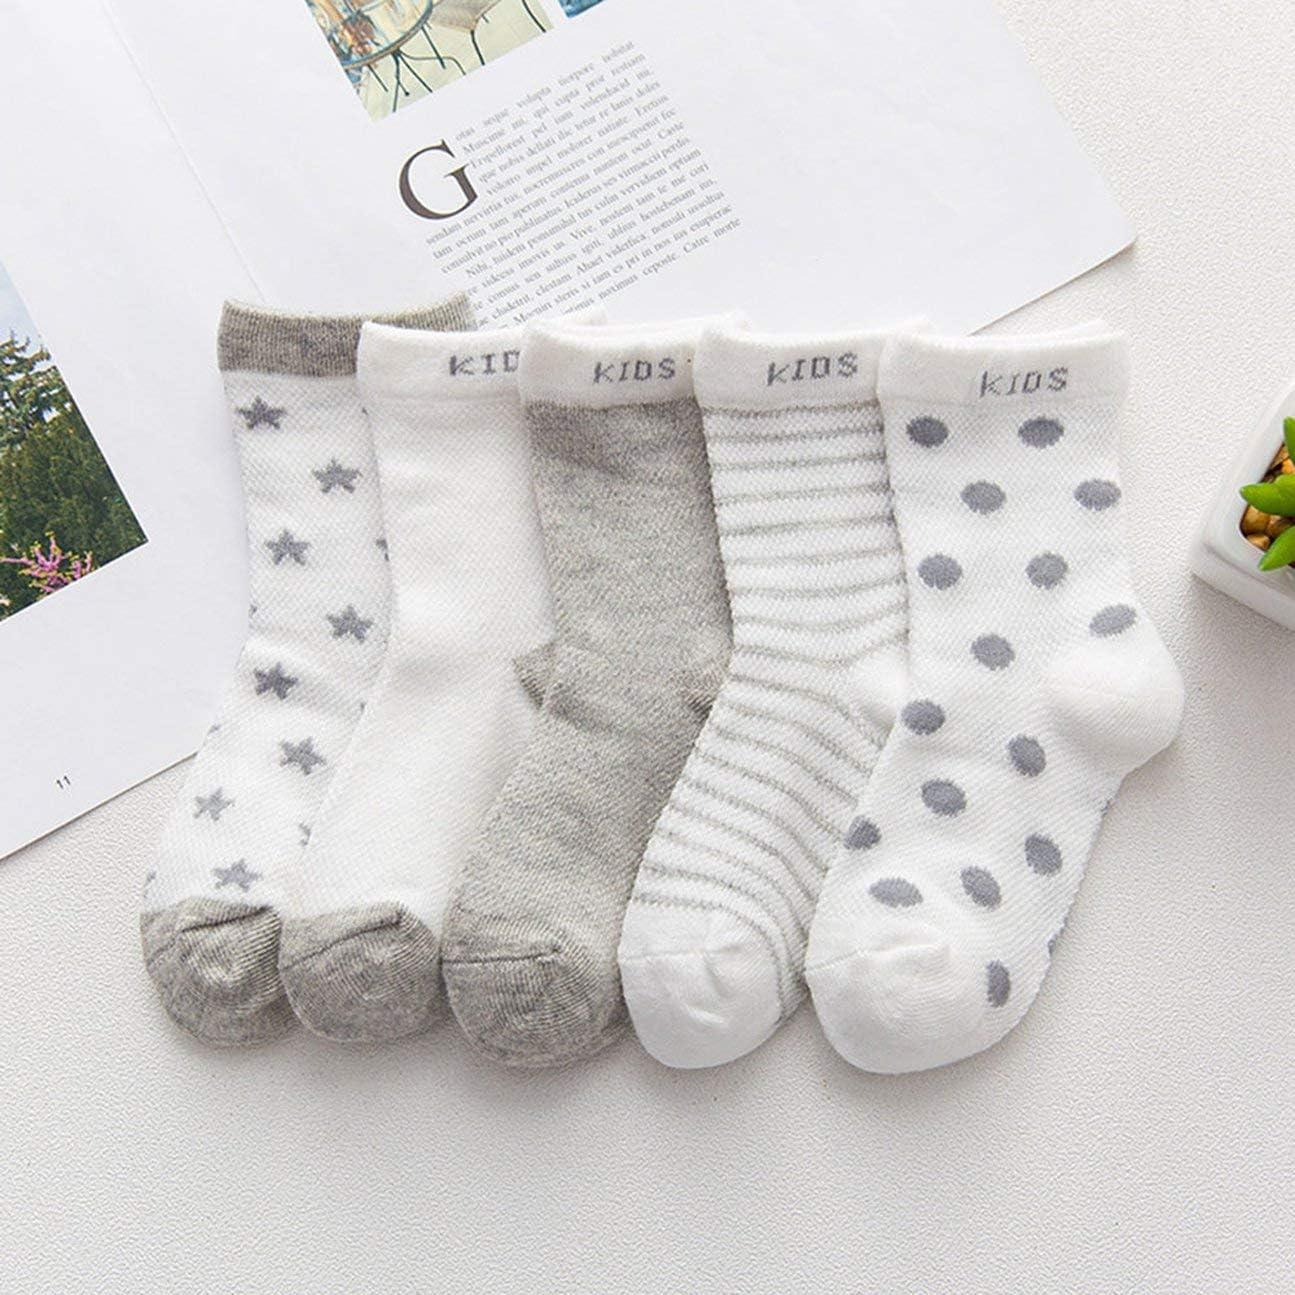 HIPENGYANBAIHU Baby Boys Girls No Slip Socks Stars Moon Socks Baby Shoes Kids Winter Warm Thick Socks Shoes for 0-3 Years Infant Baby